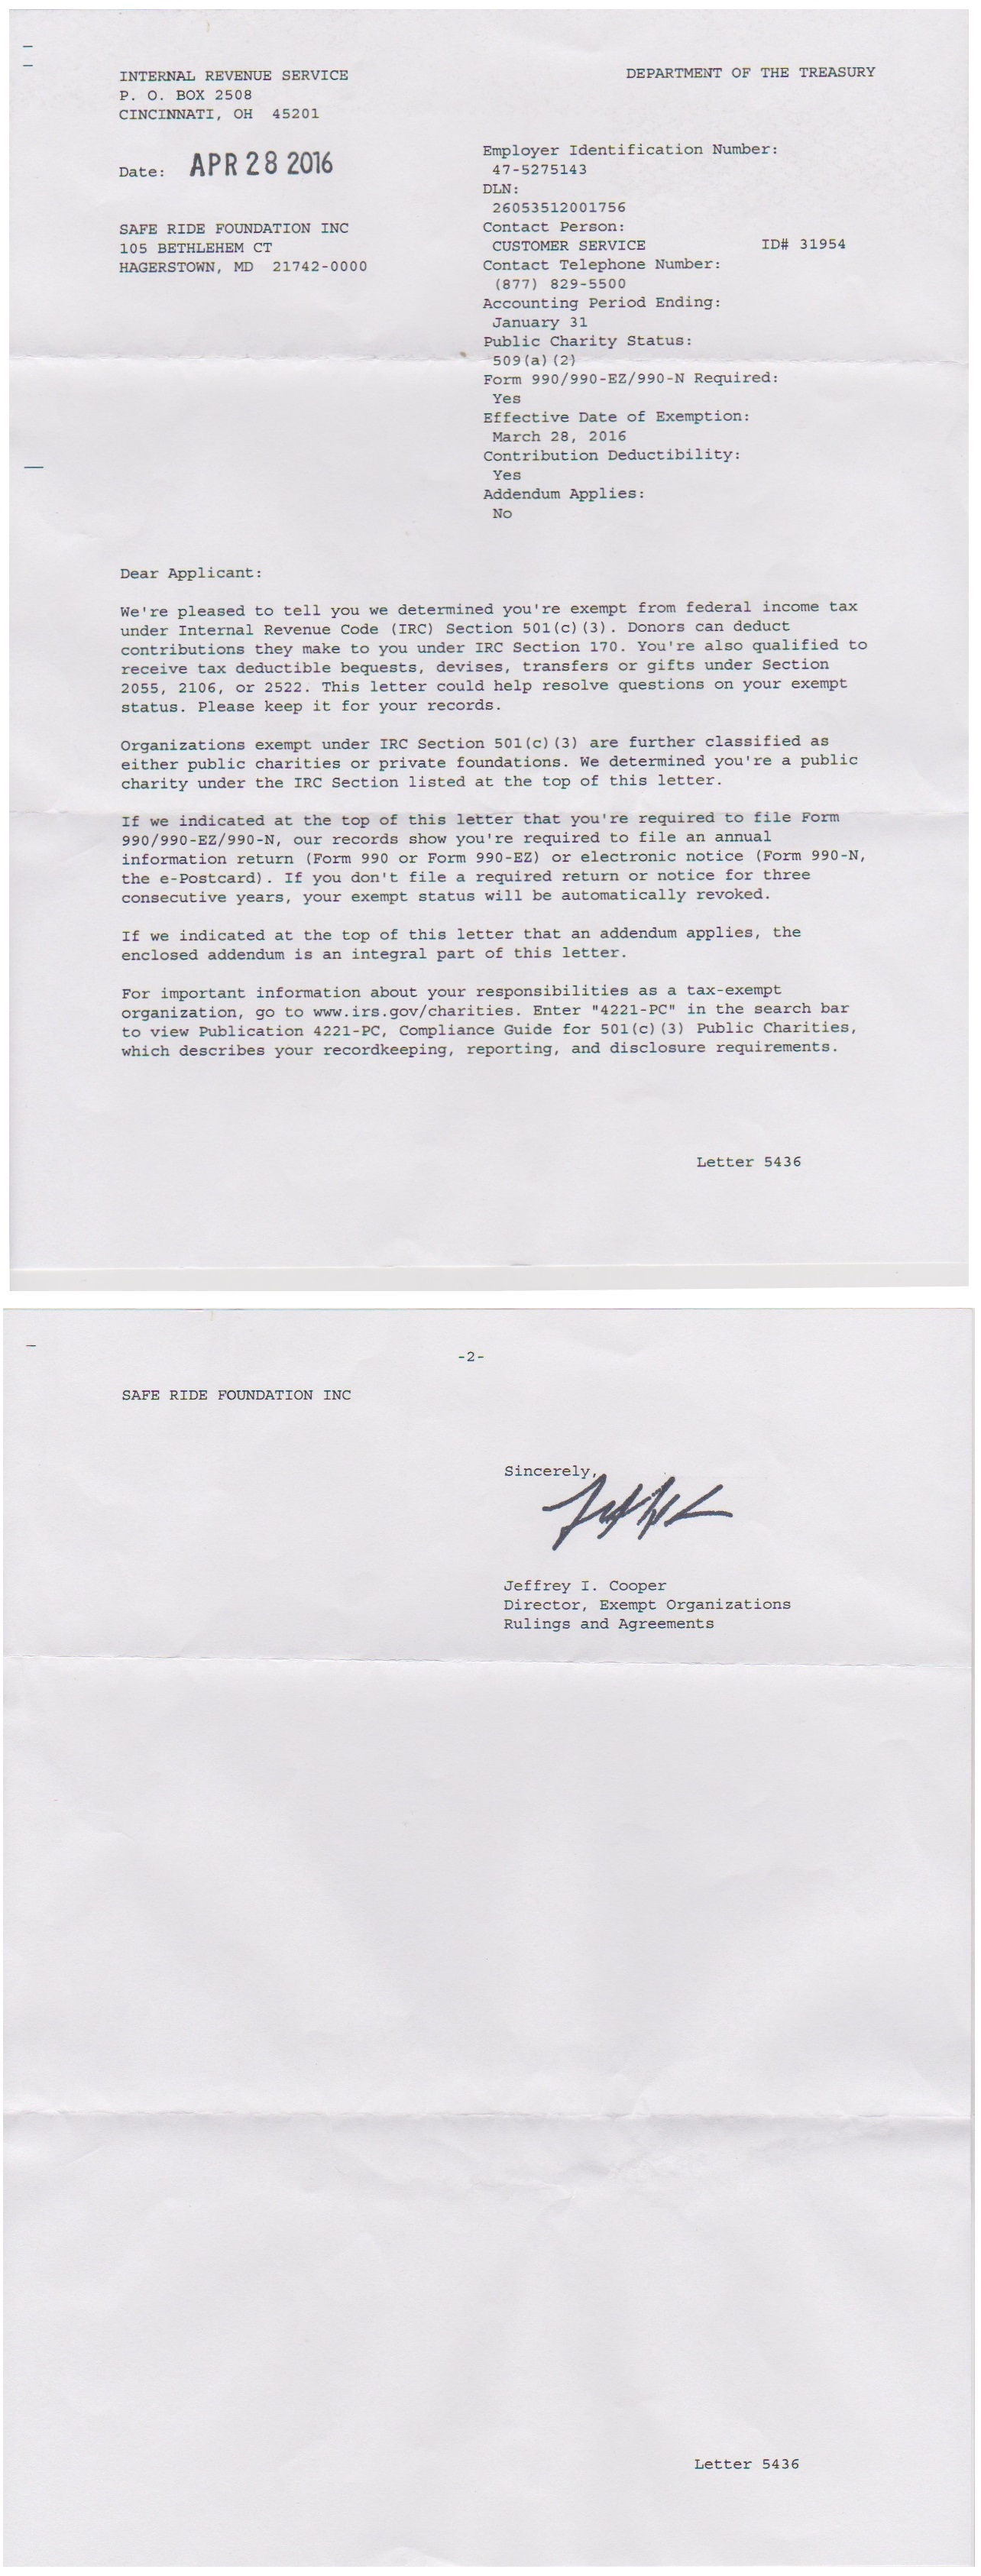 IRS 501(c)3 Determination Letter